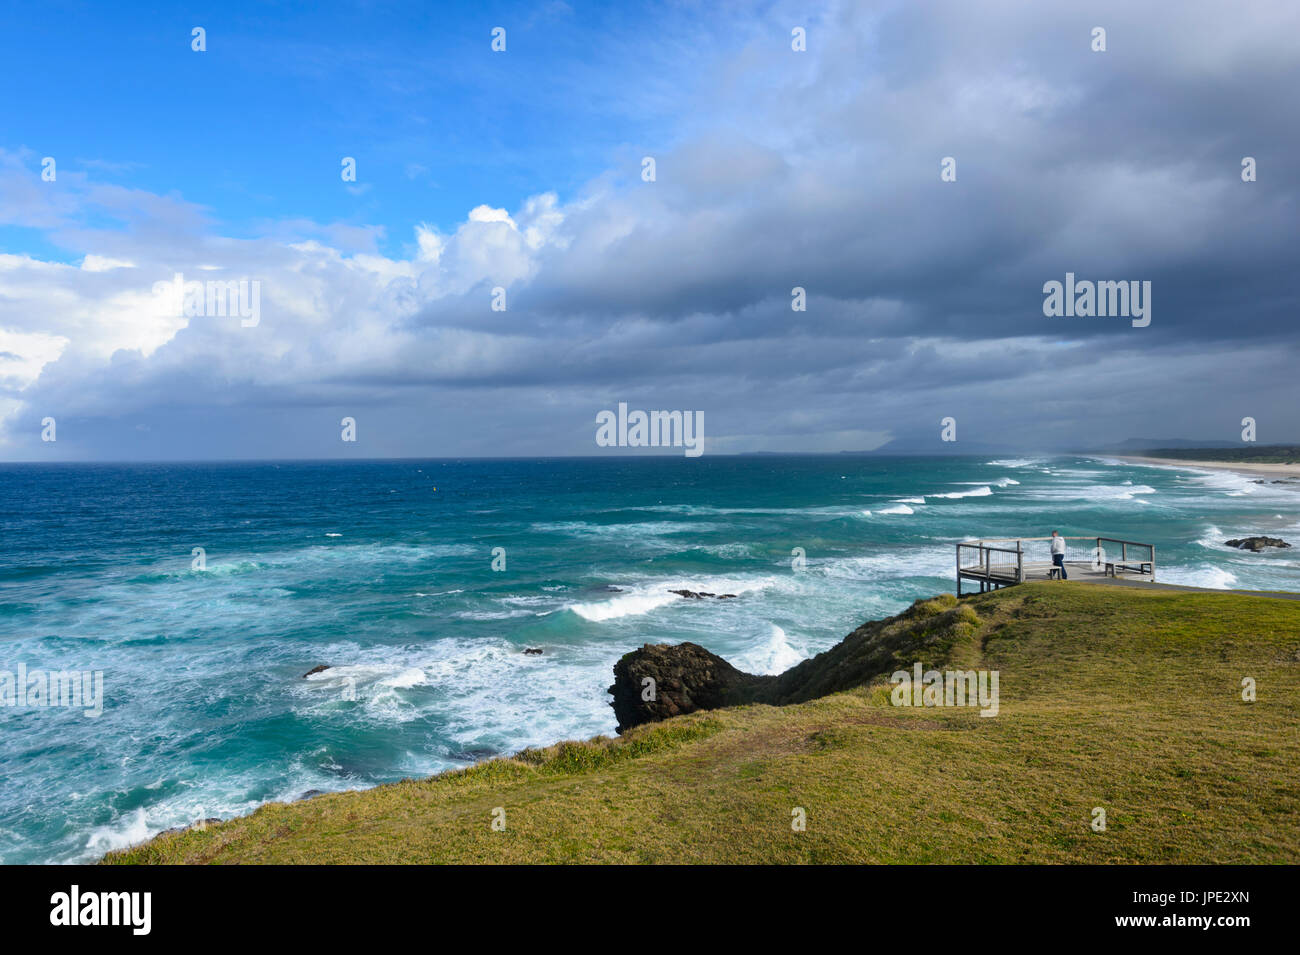 Vue depuis l'adherence Point, Port Macquarie, New South Wales, NSW, Australie Banque D'Images